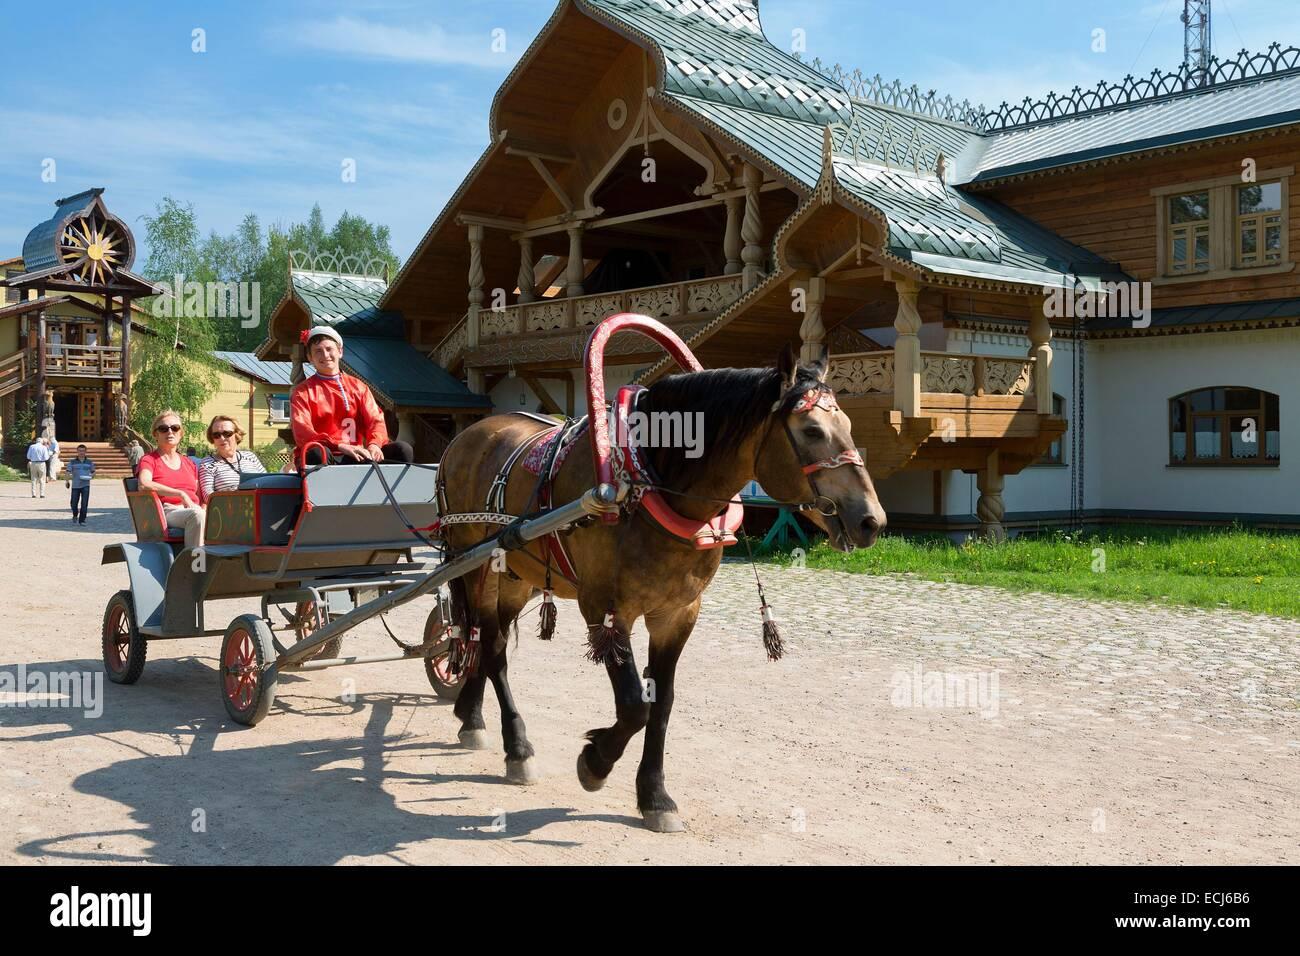 Russia, Verkhniye Mandrogi, A horse drawn carriage - Stock Image